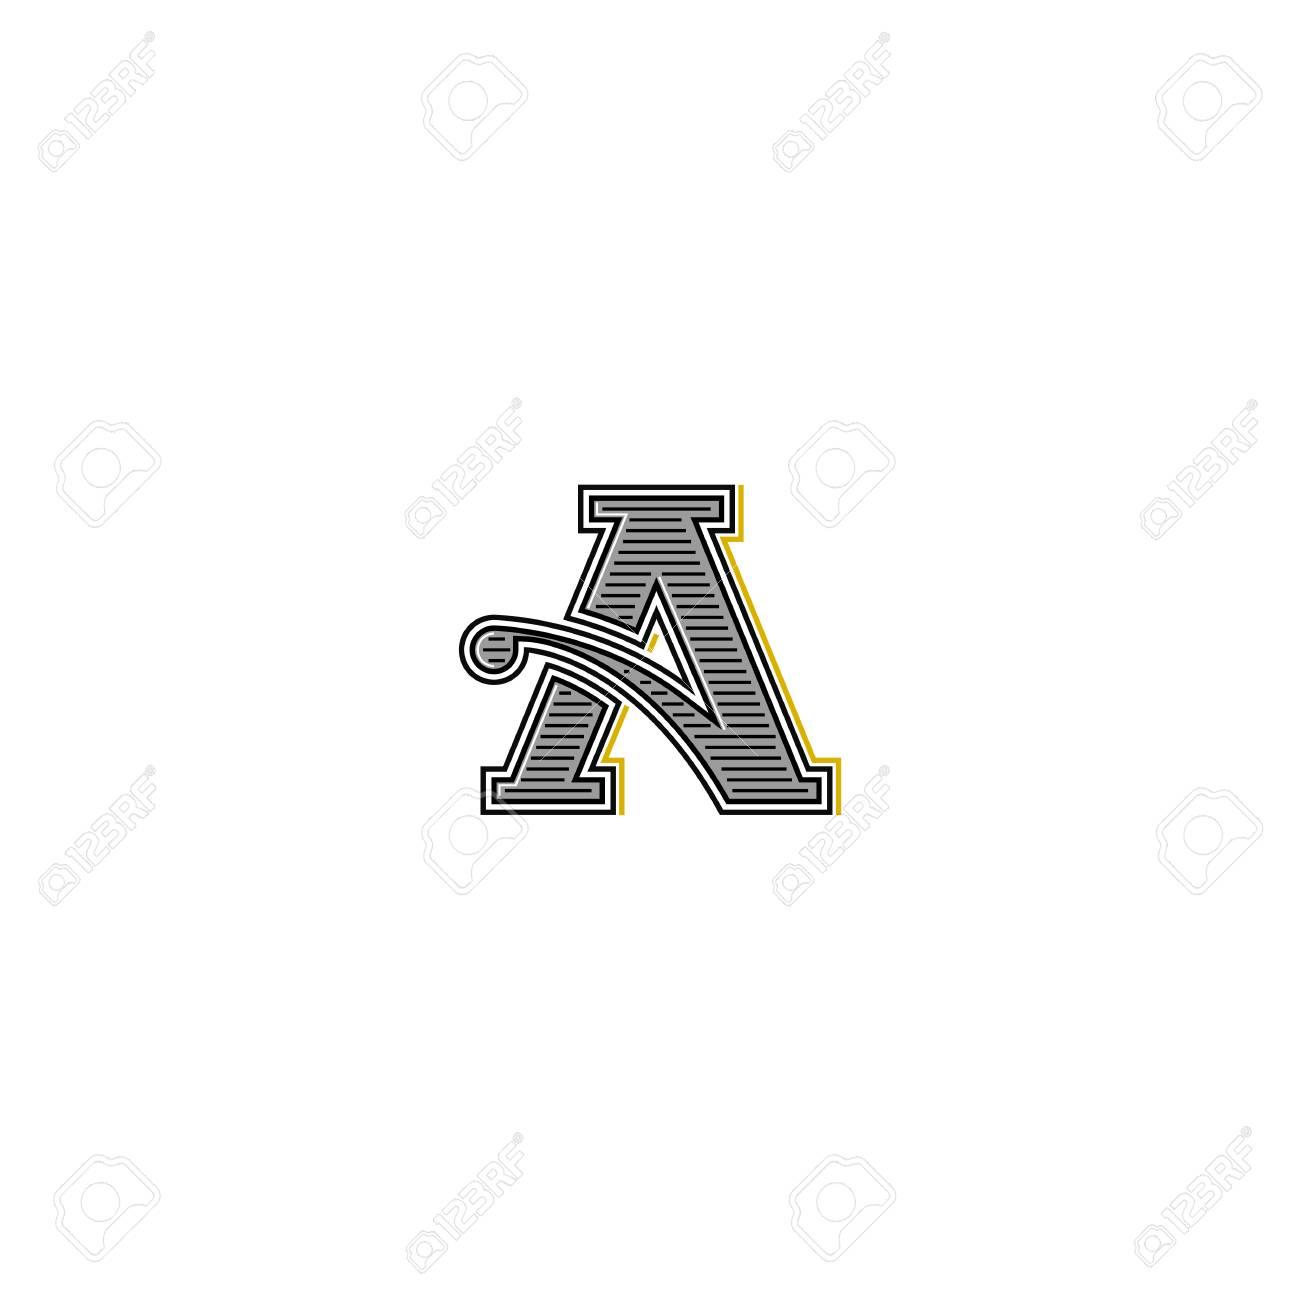 Lettre Rtro Invitation De Mariage Monogramme Typographie